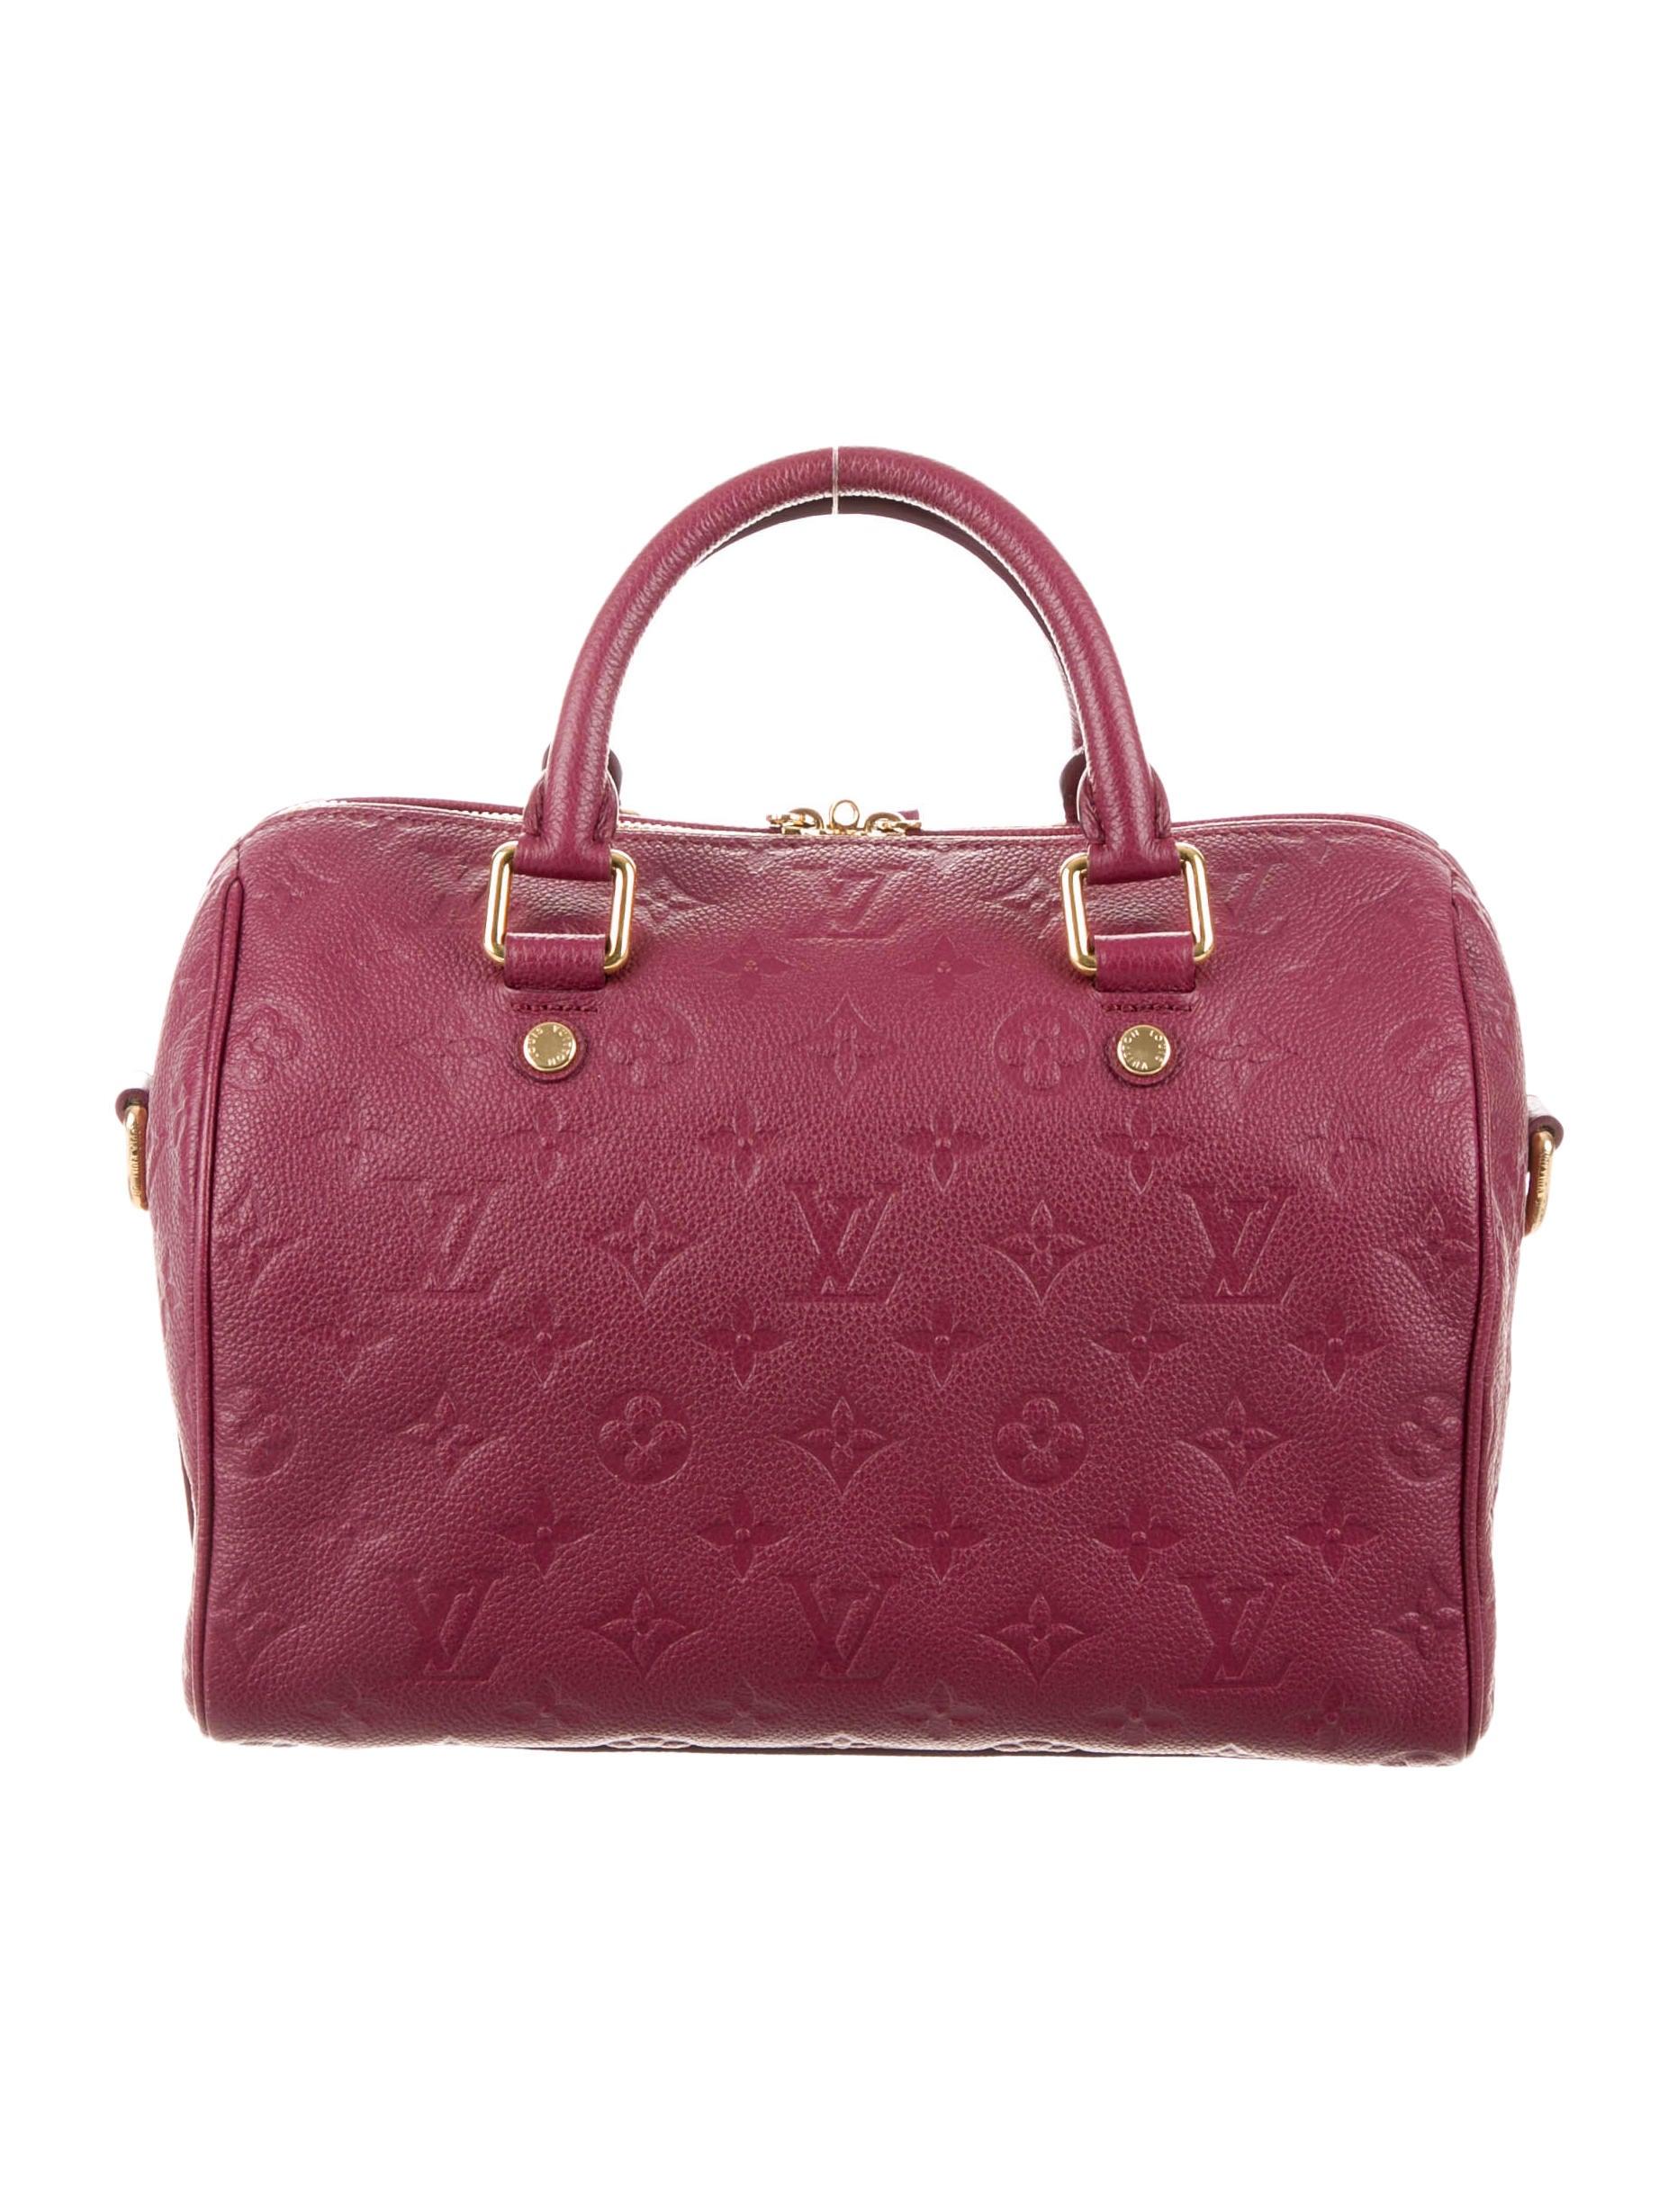 ae4fd6aad247 Louis Vuitton Empreinte Speedy Bandoulière 25 - Handbags - LOU74925 ...